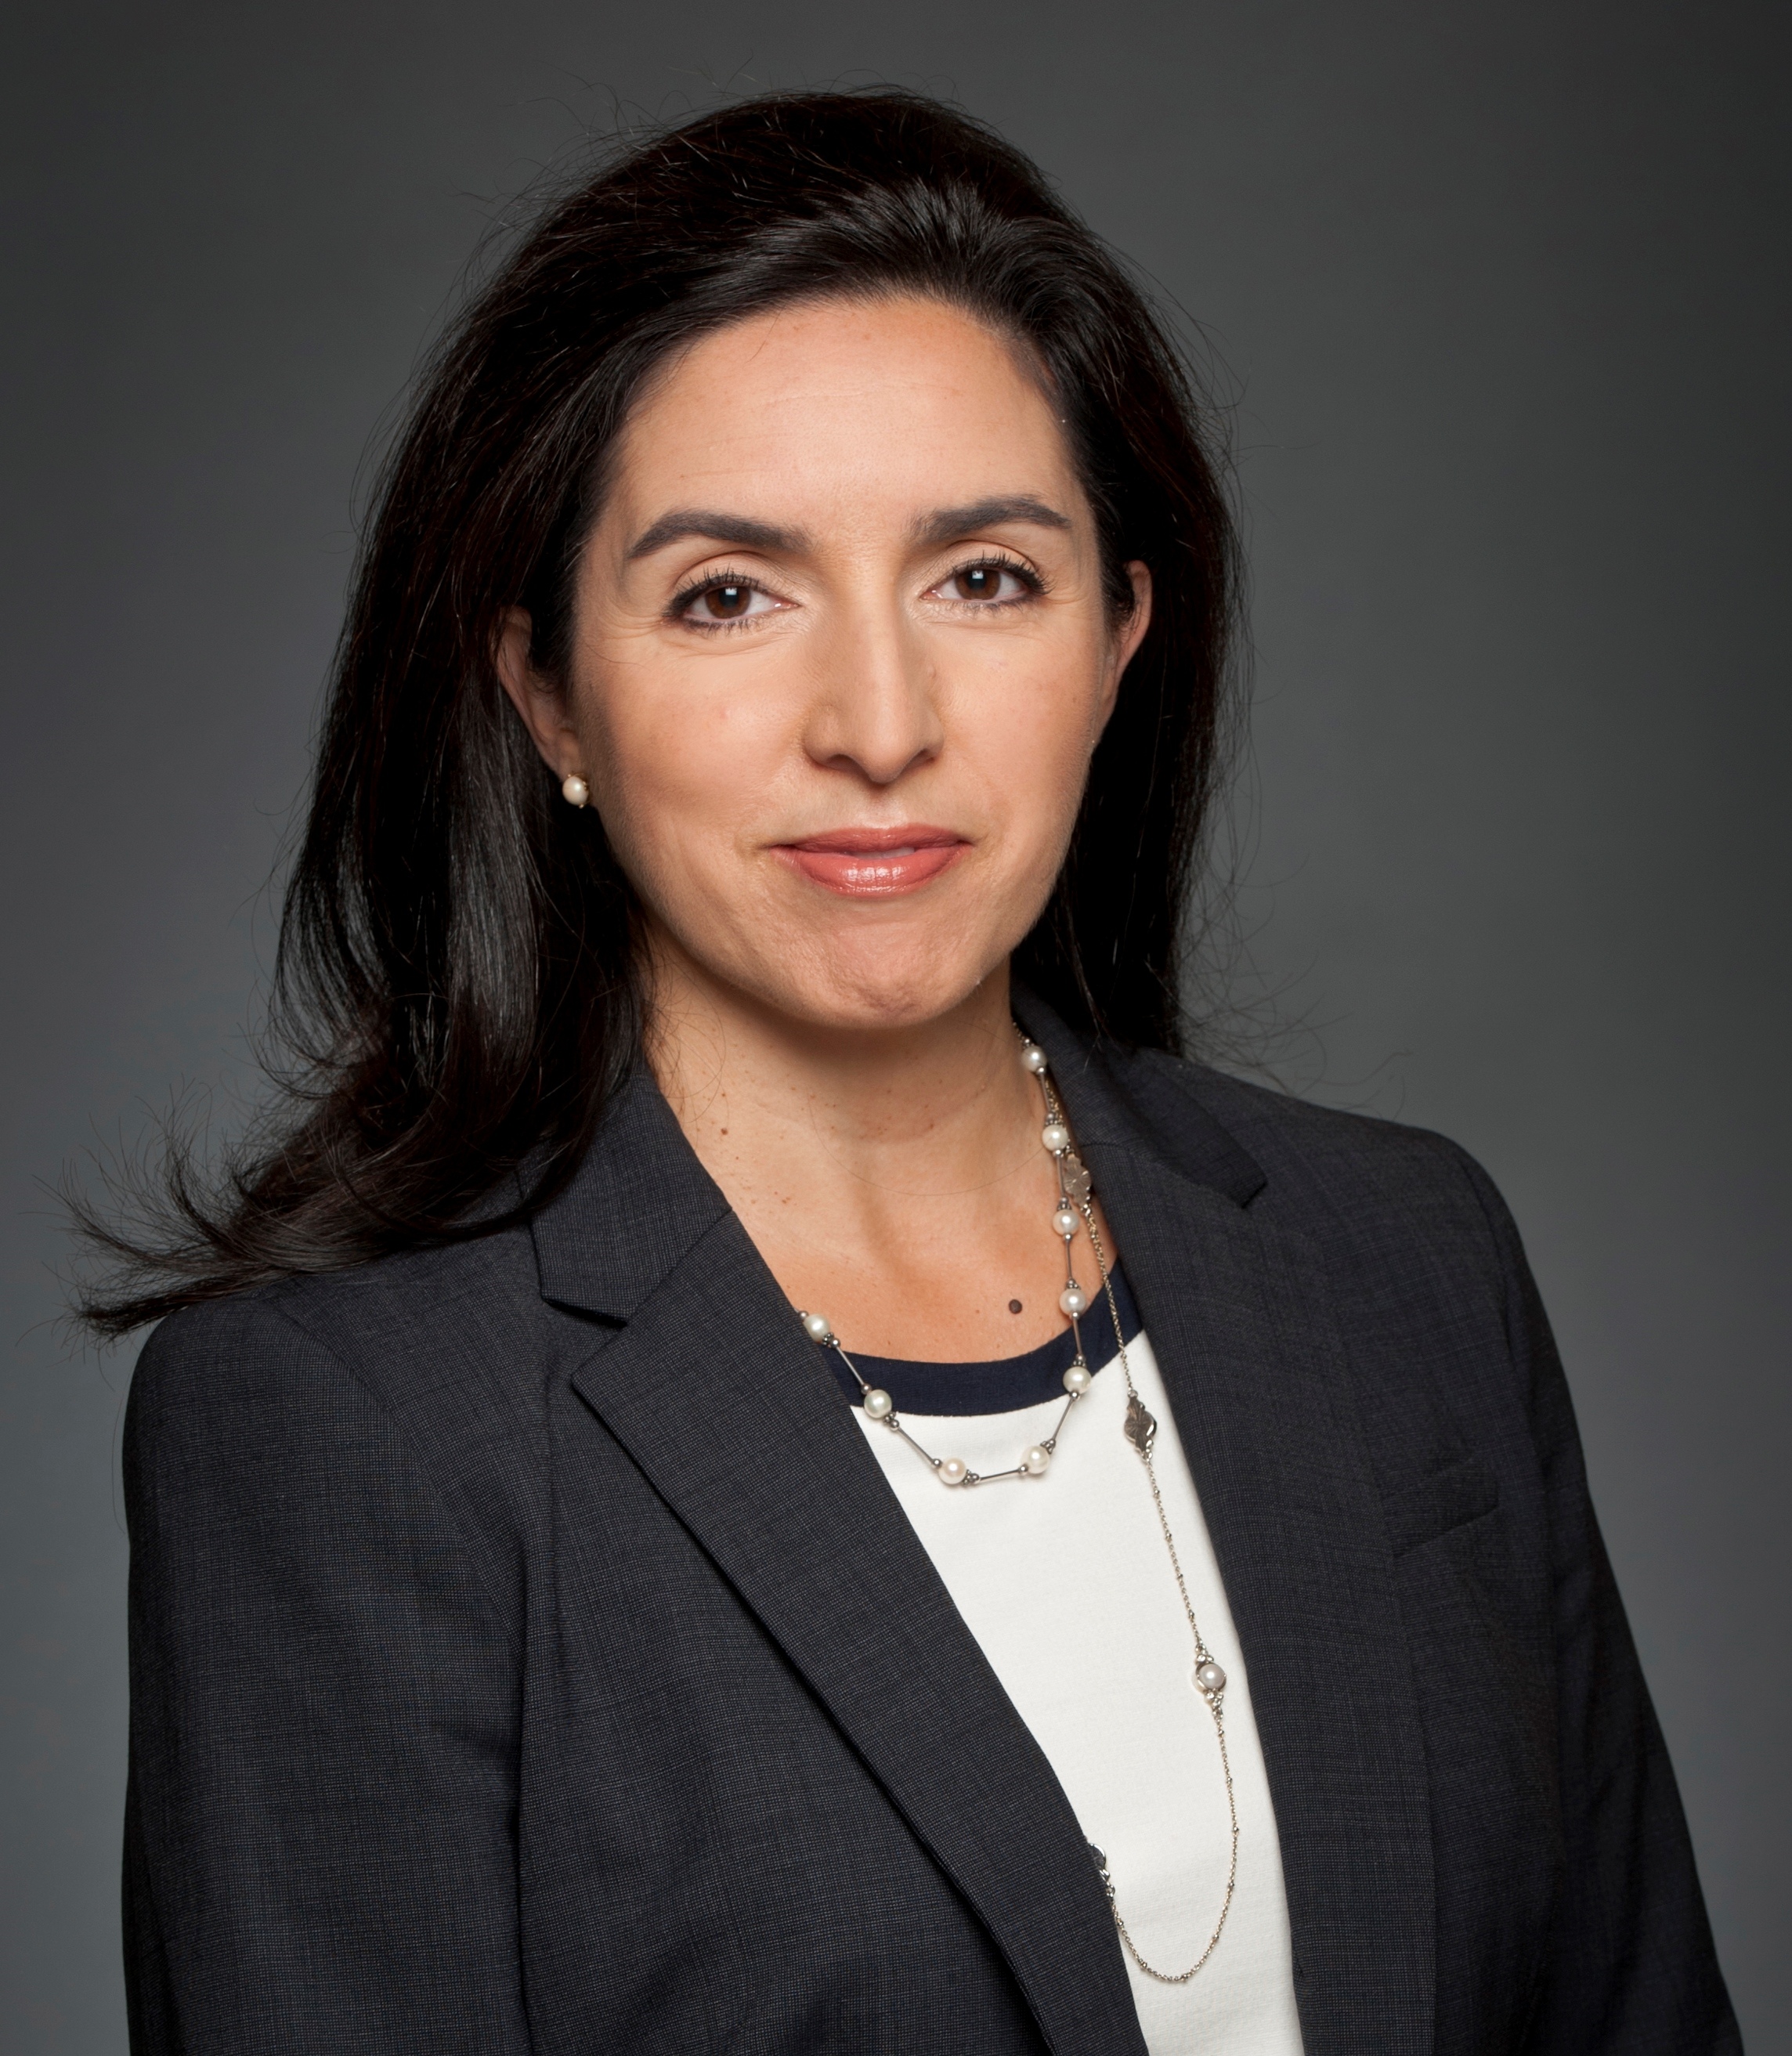 Viviana Fernandez - Assistant Director, HRREC | Directrice adjointe, CREDP